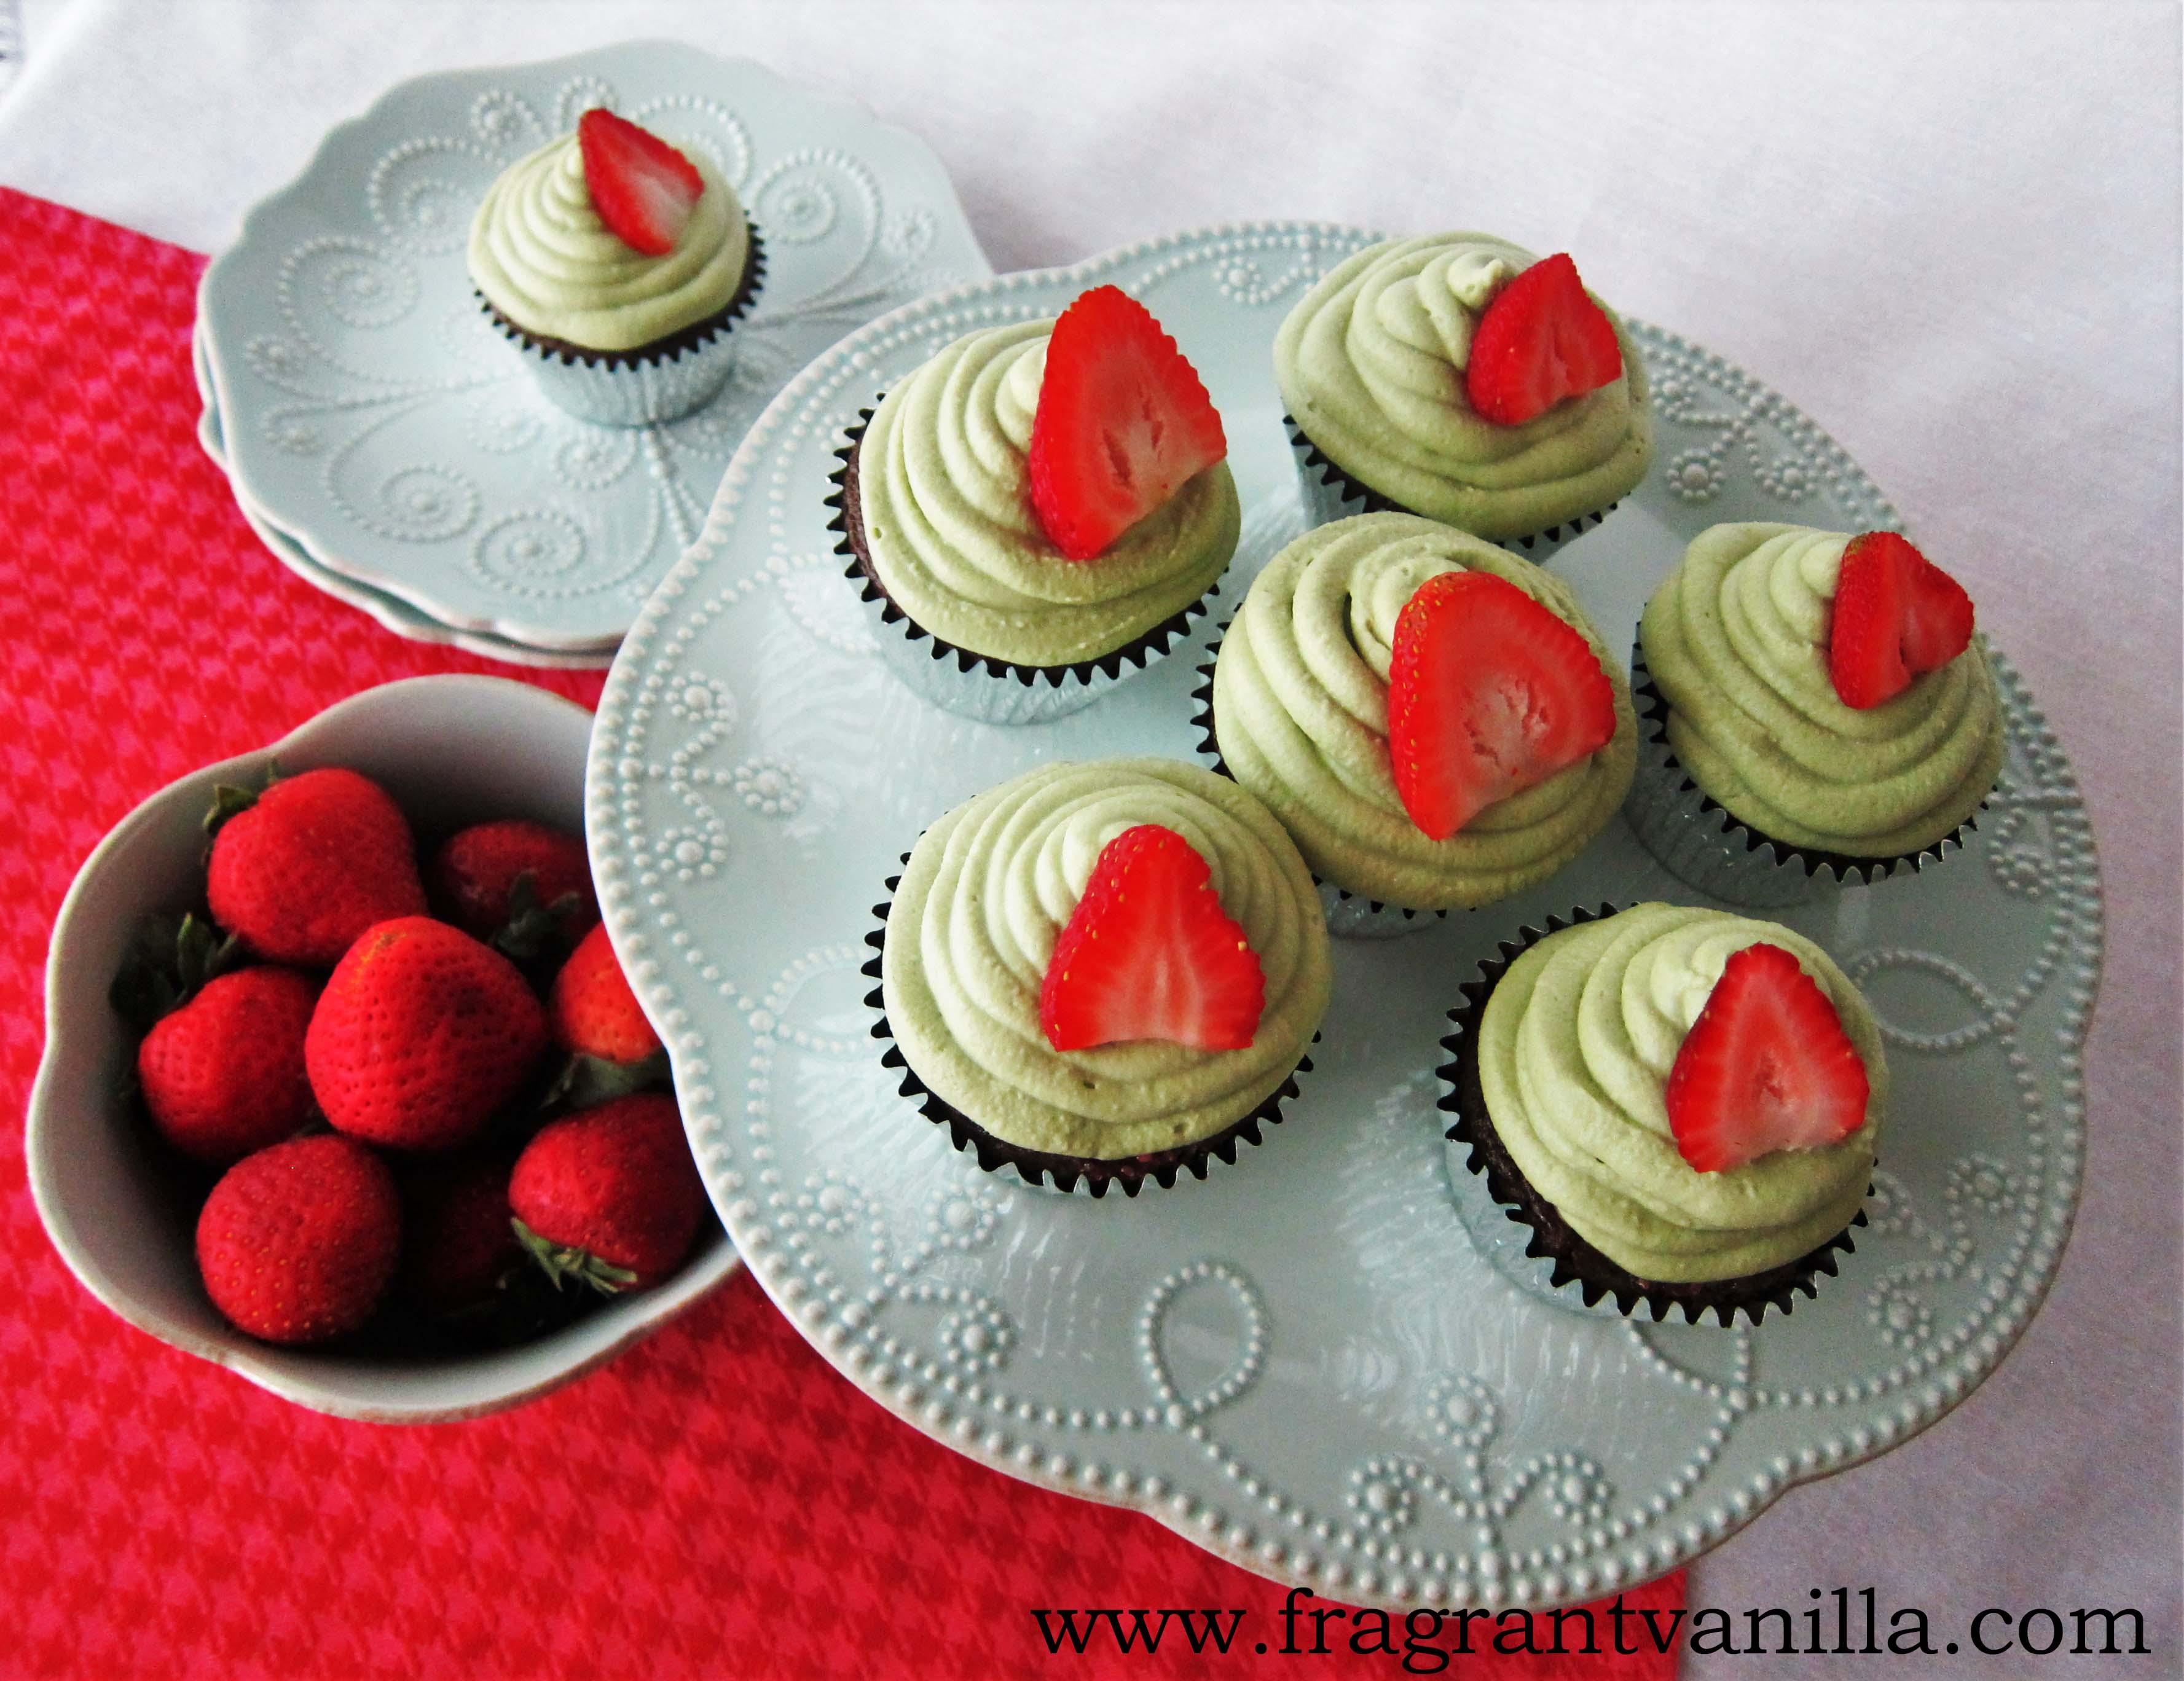 Vegan Green Tea Strawberry Rhubarb Cupcakes